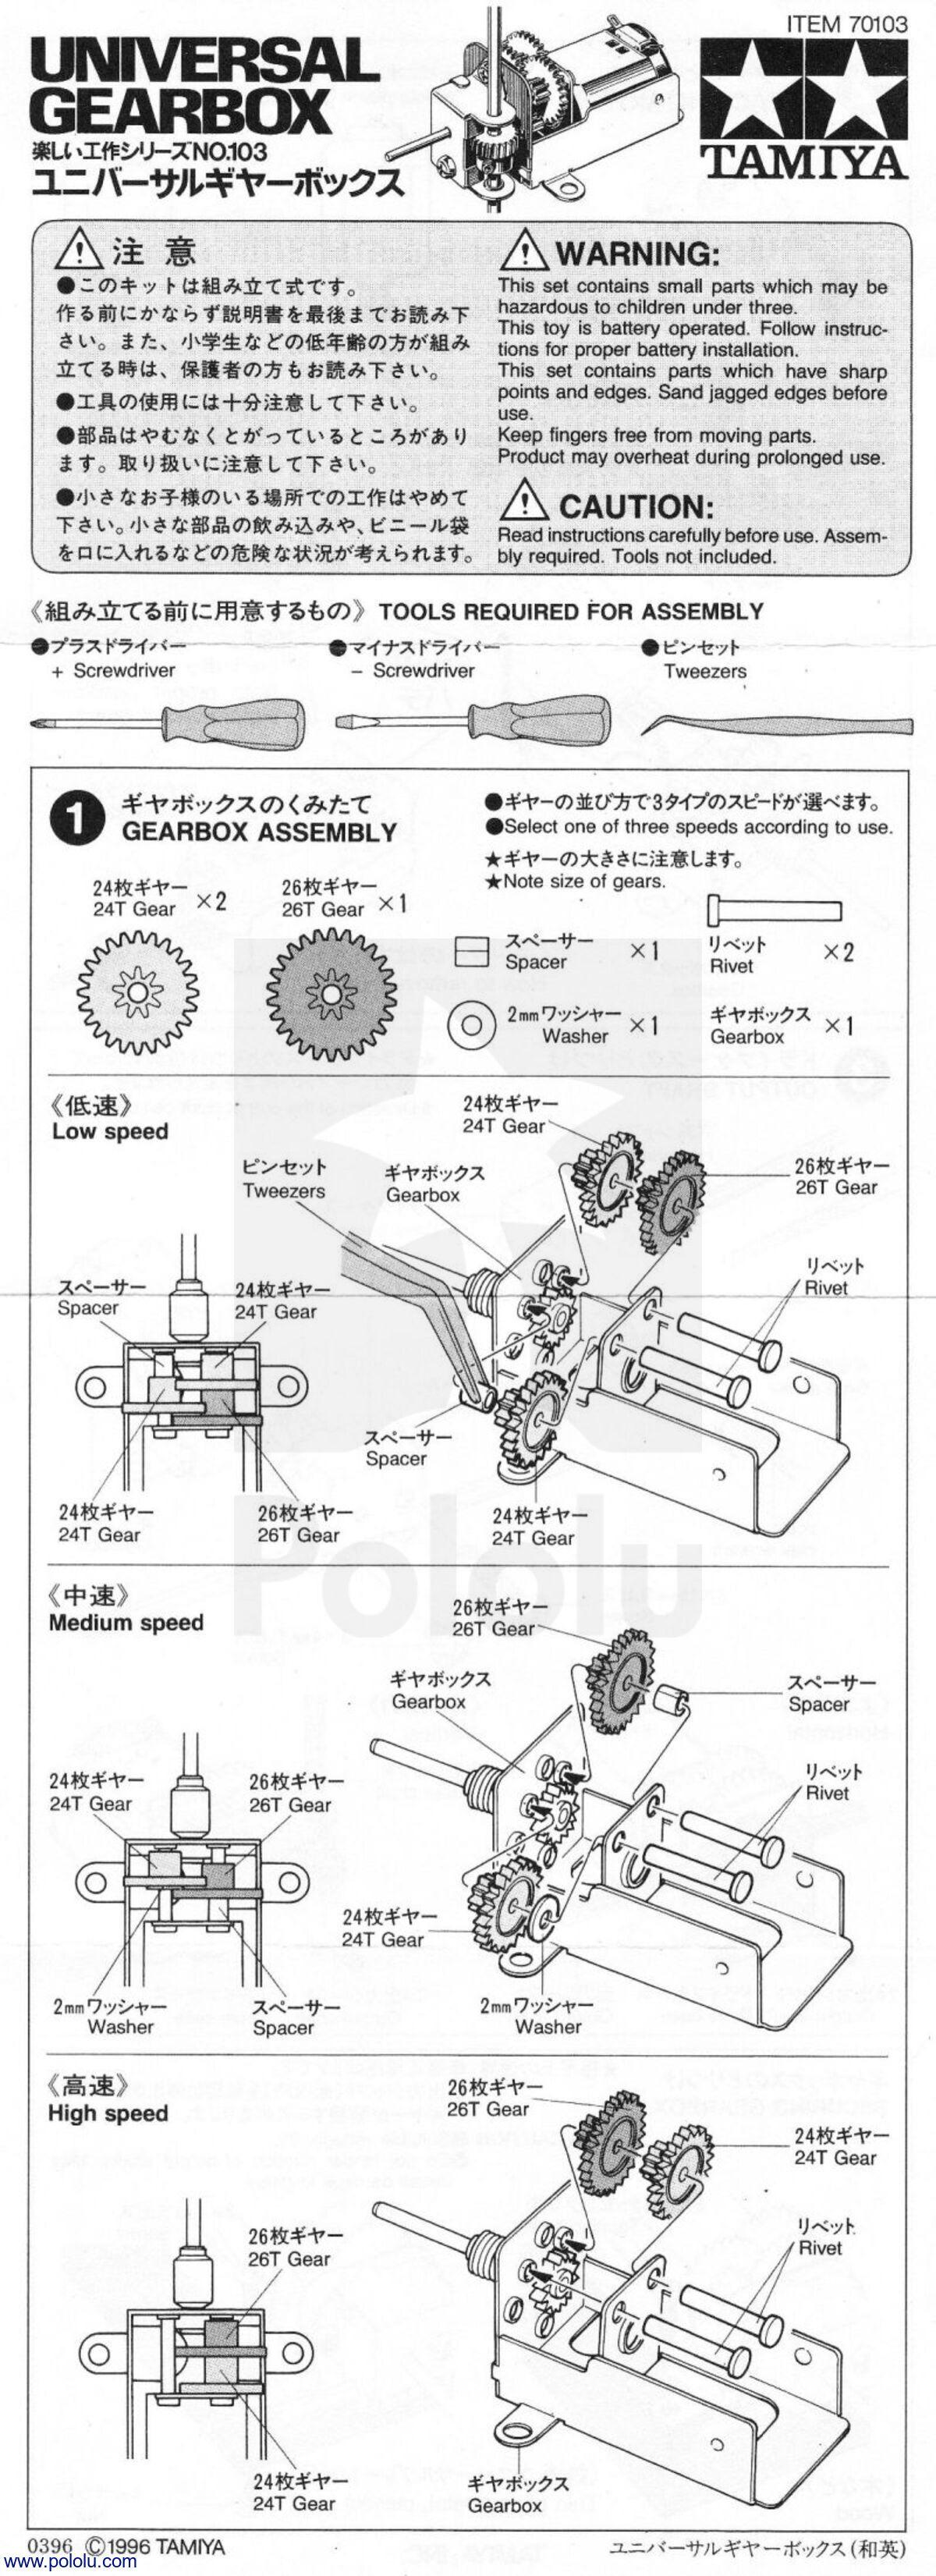 Pololu Tamiya 70103 Universal Gearbox Kit